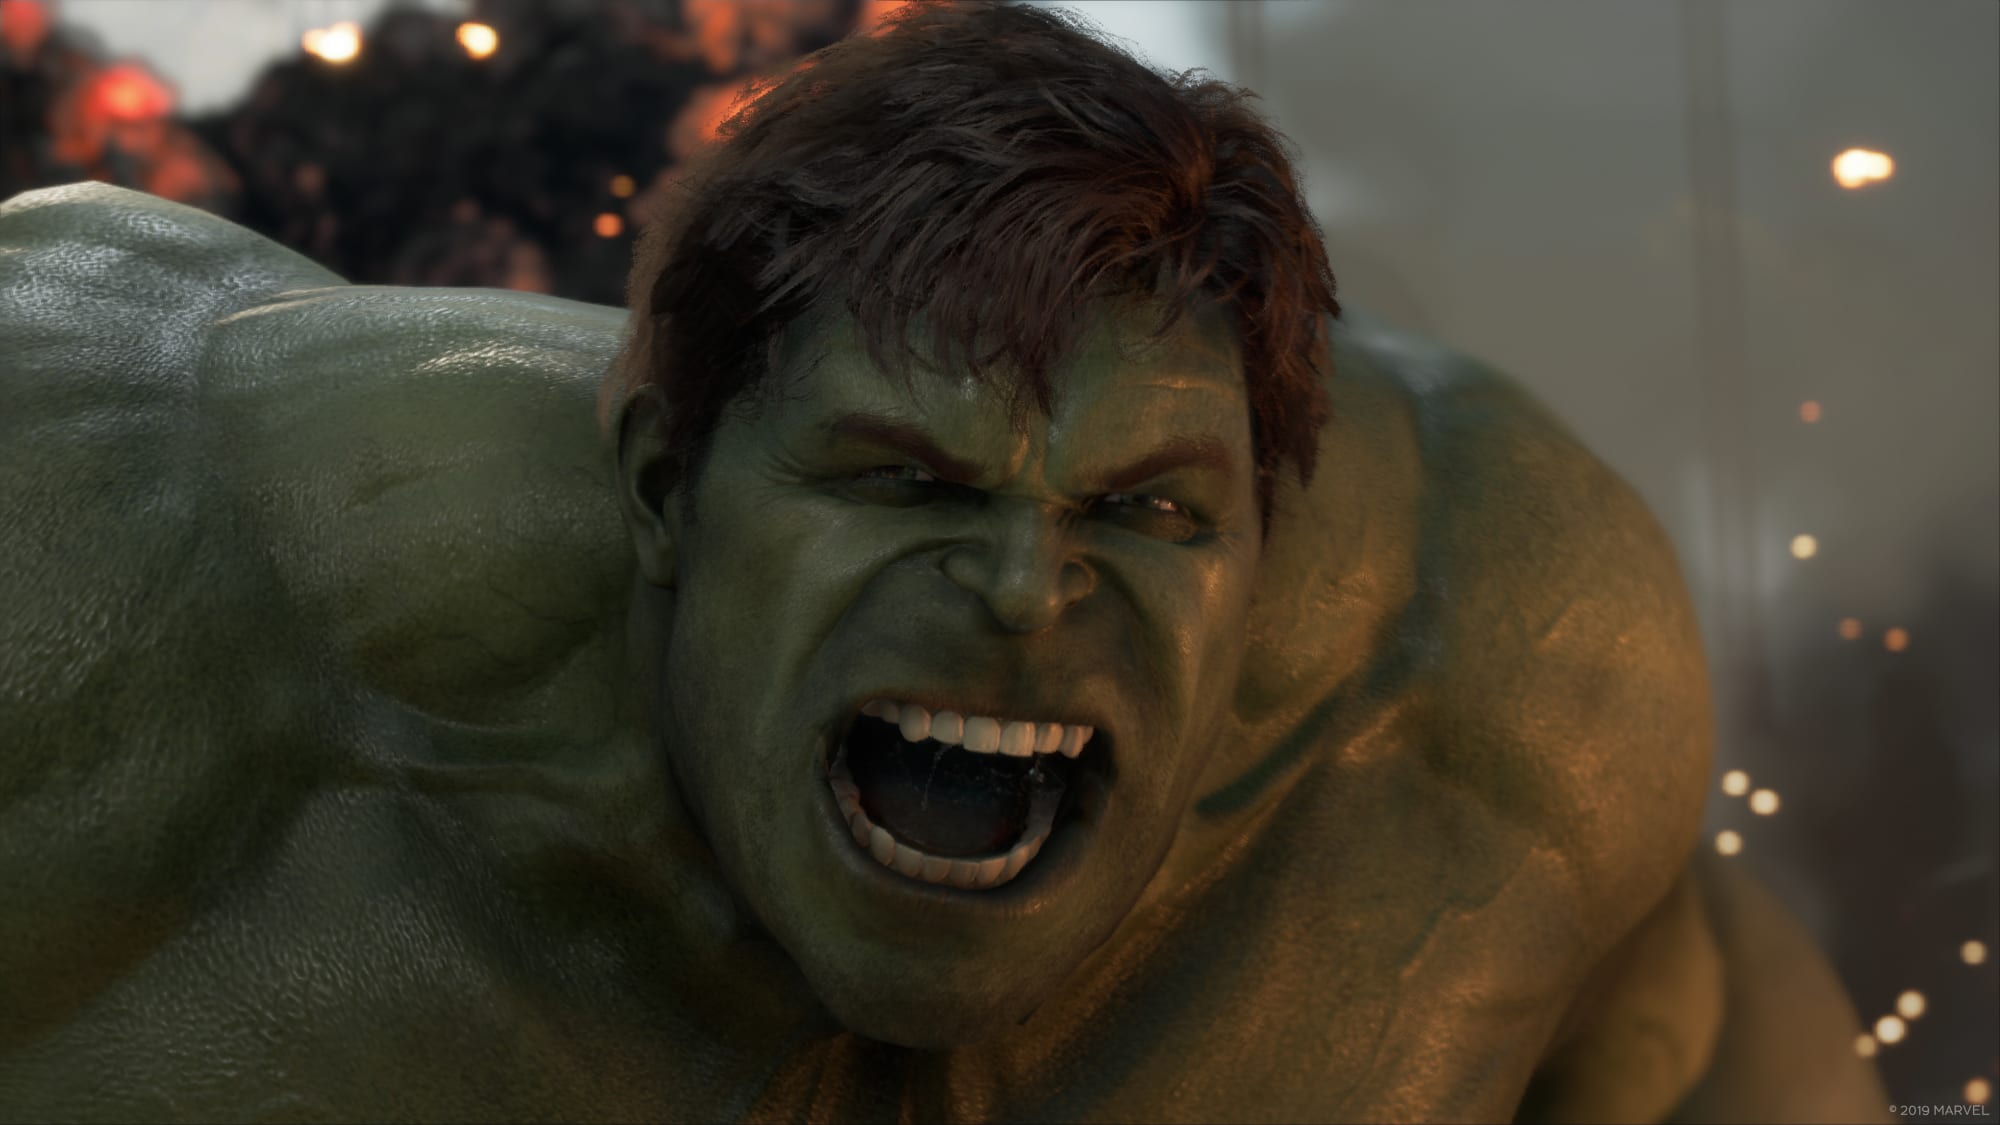 Fortnite: How to get the Hulk Smashers Pickaxe from Marvel's Avengers